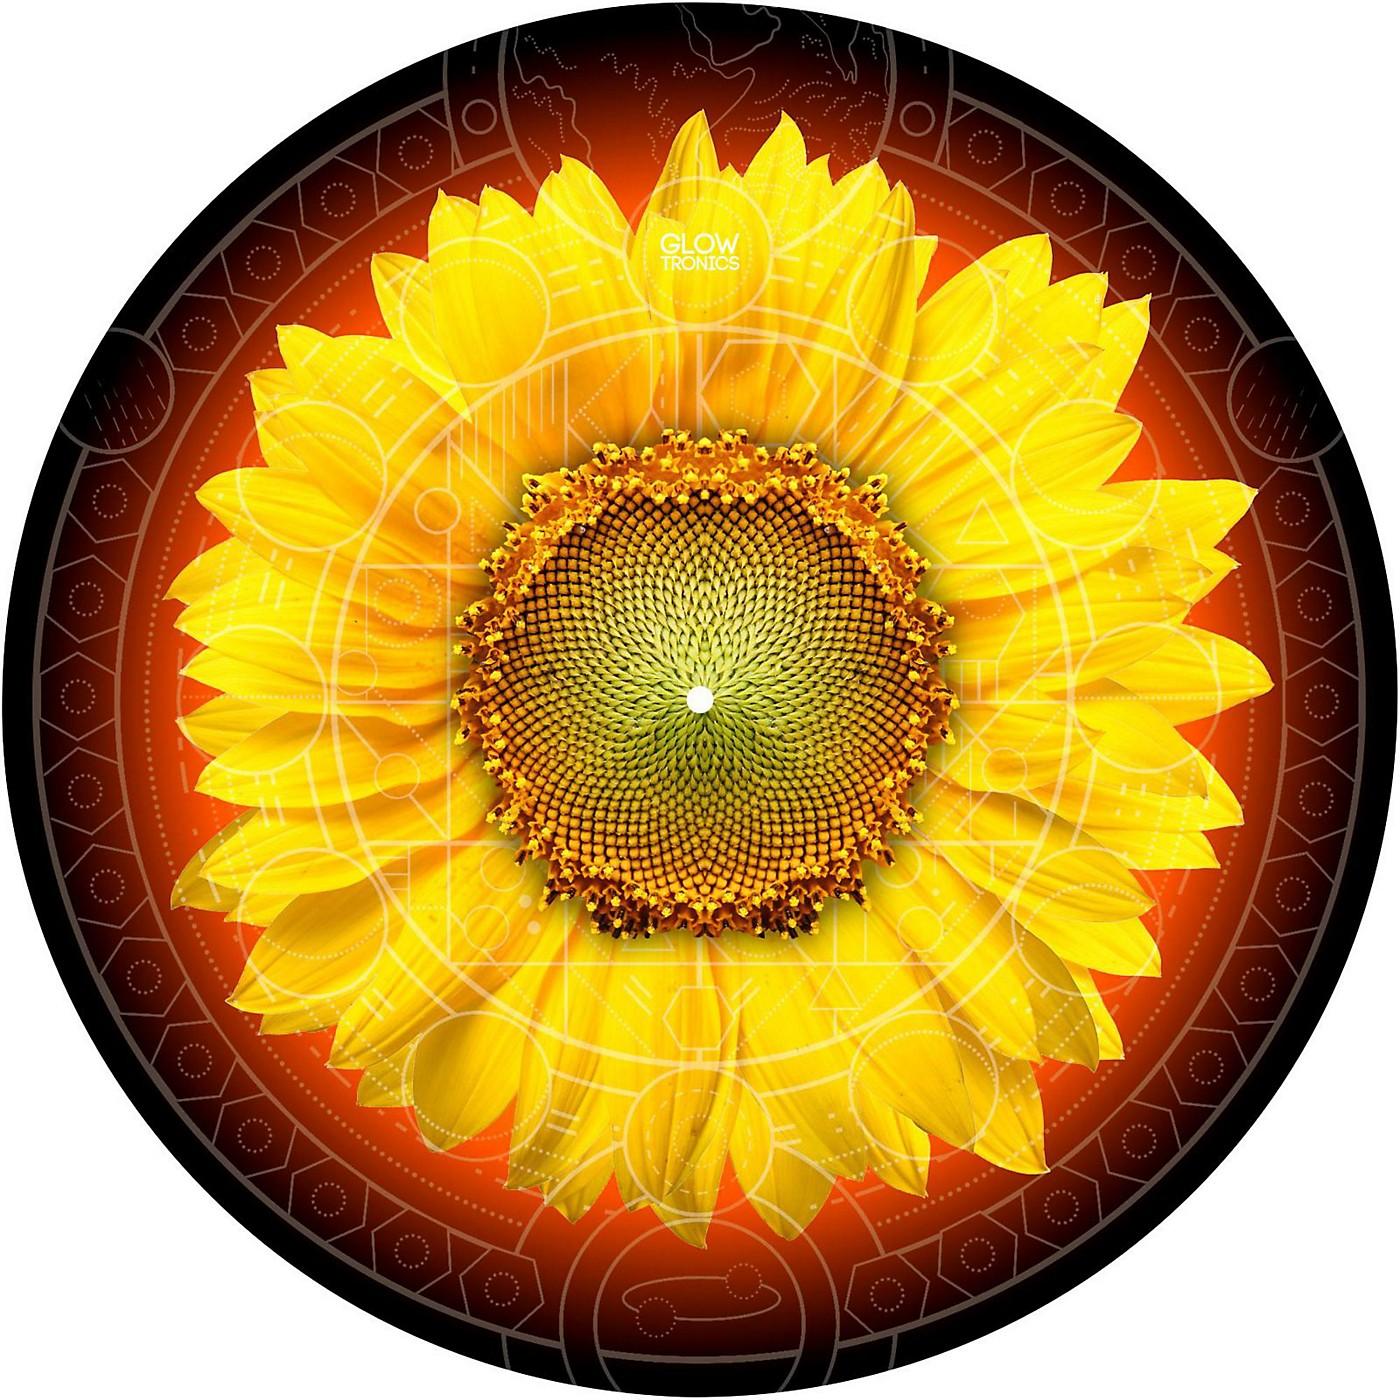 Glowtronics 12 in. Sunflower Glow-in-the-Dark DJ Slipmats thumbnail